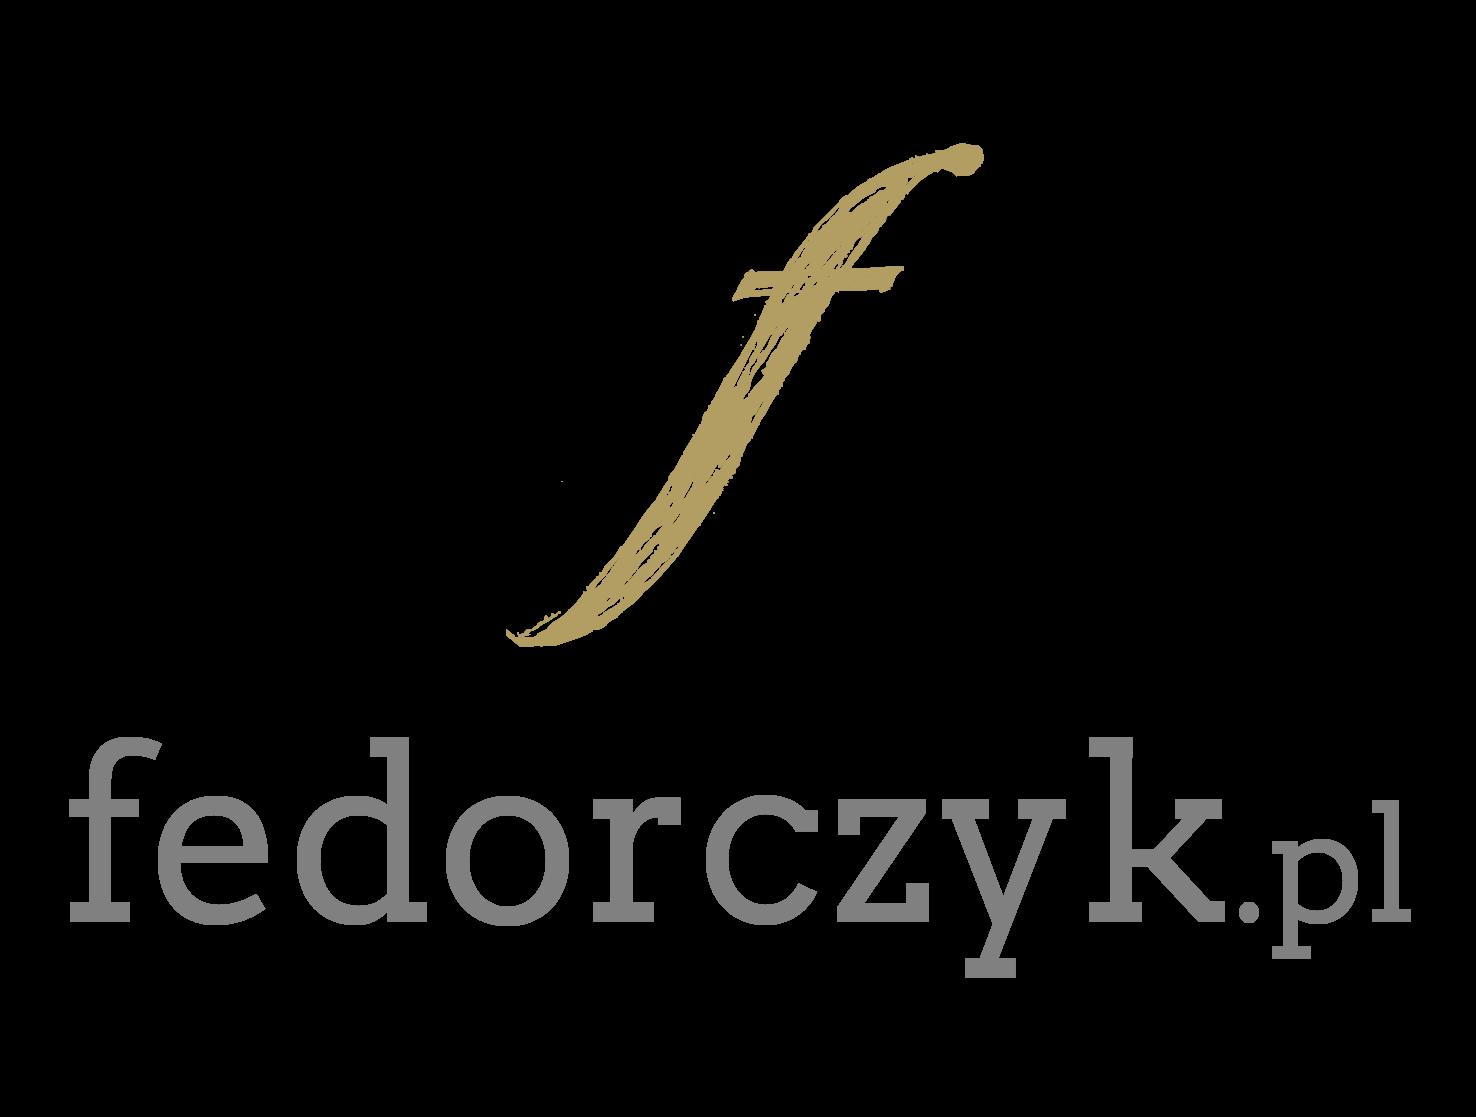 fedorczyk.pl Logo